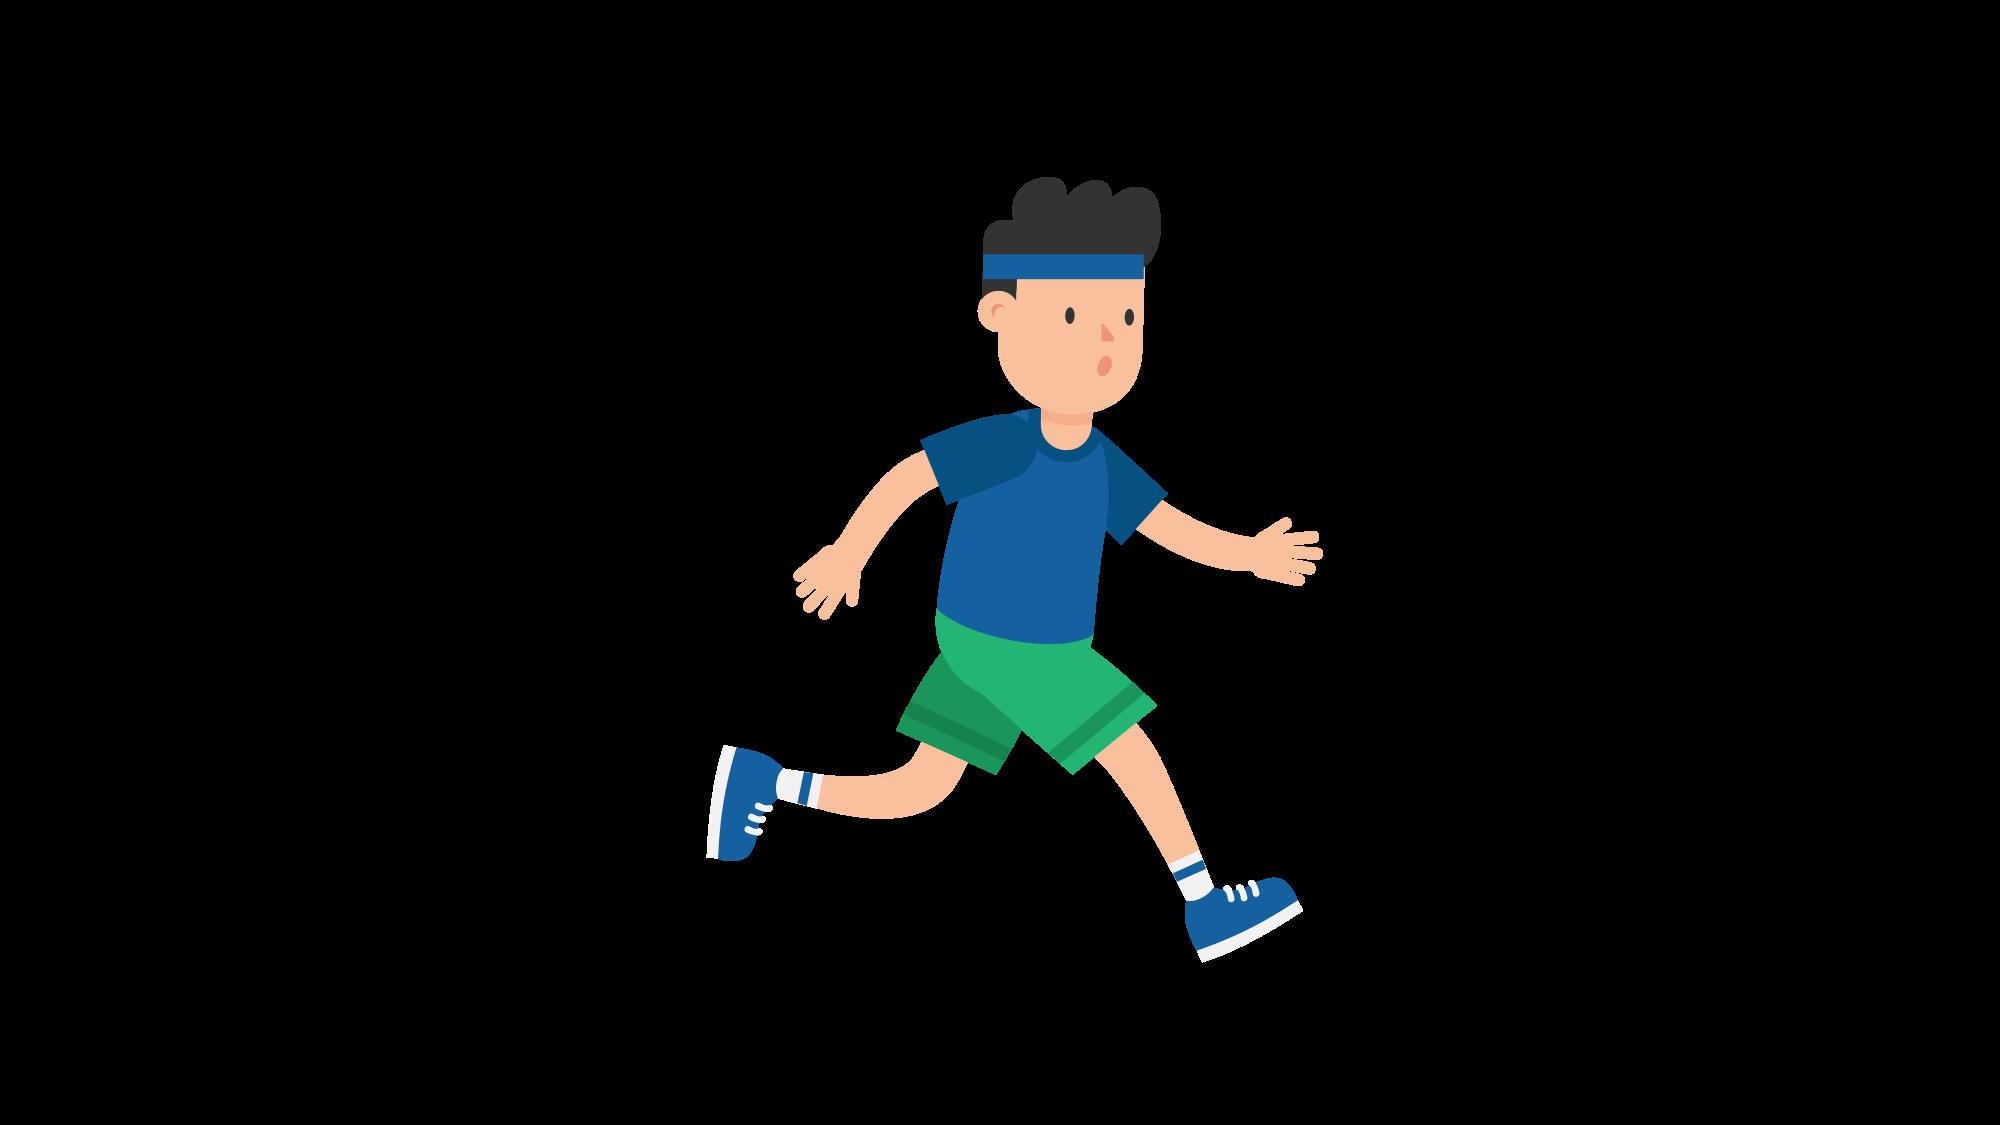 File man cartoon svg. Exercise clipart jogging